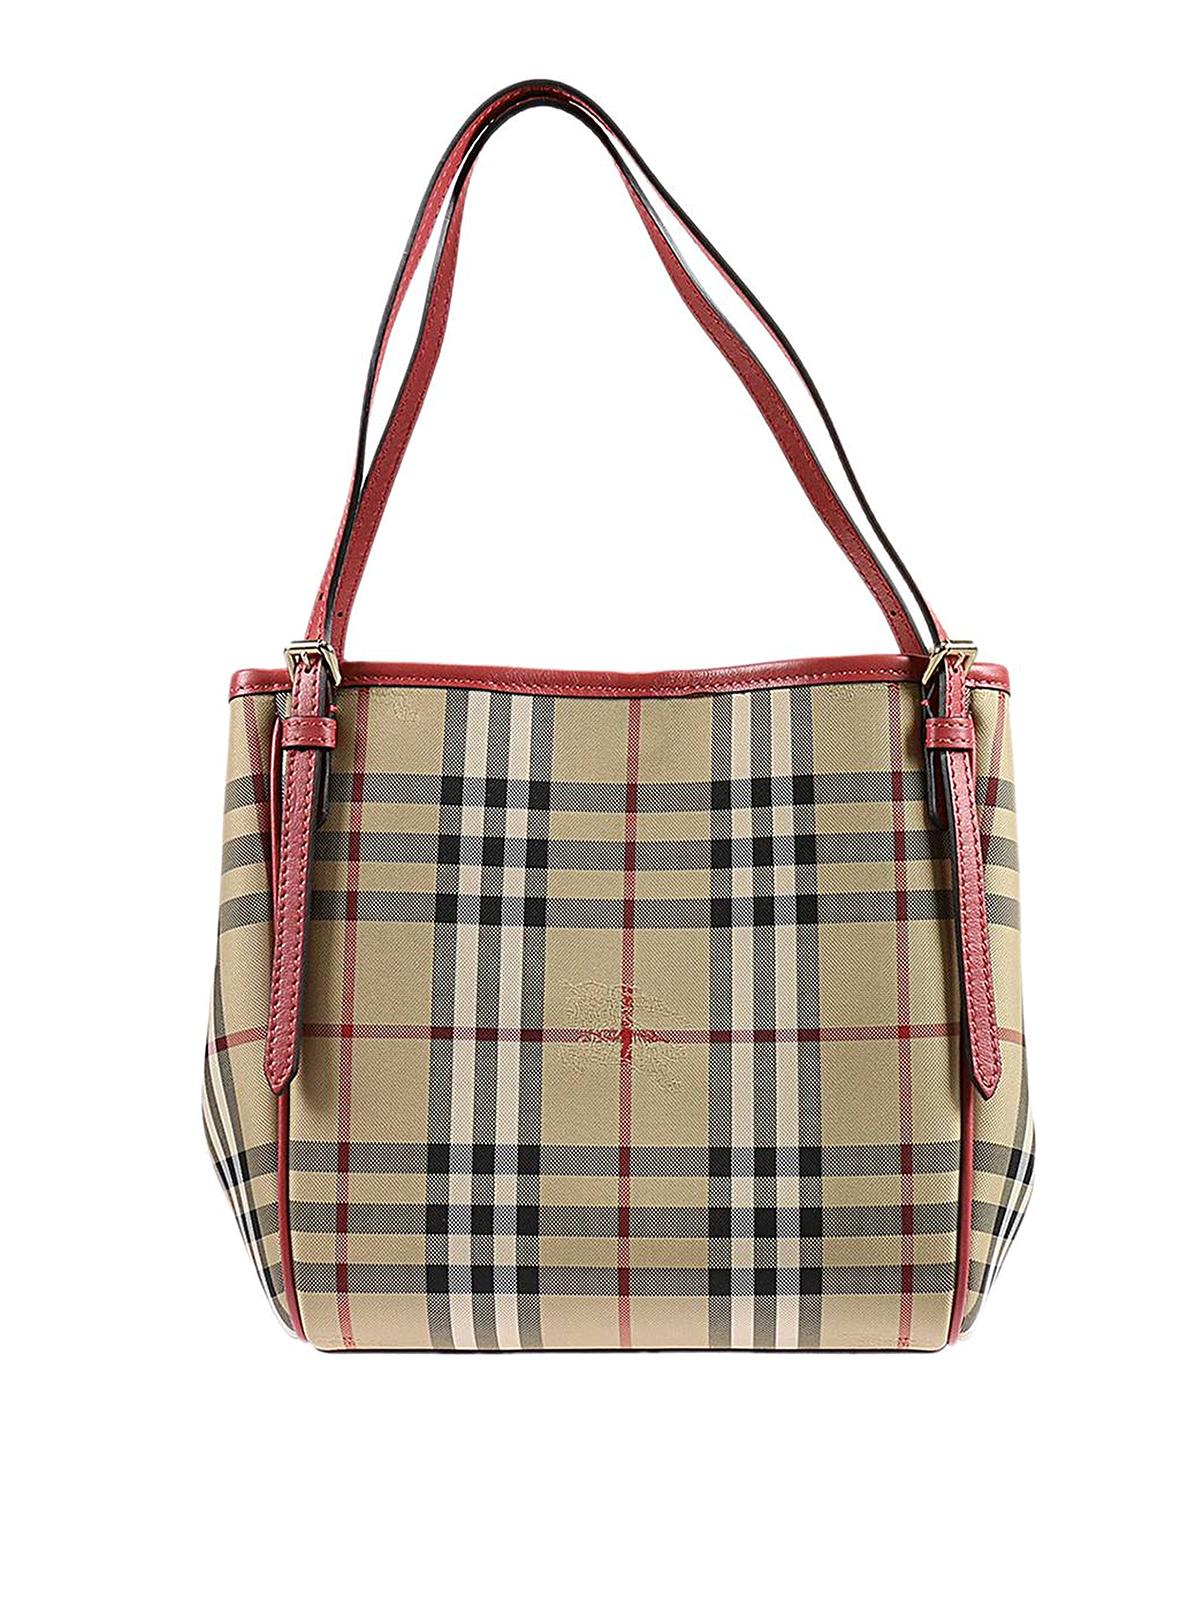 aeb2e0124779 Burberry - Mini Canter Horseferry check tote - totes bags - 40223701